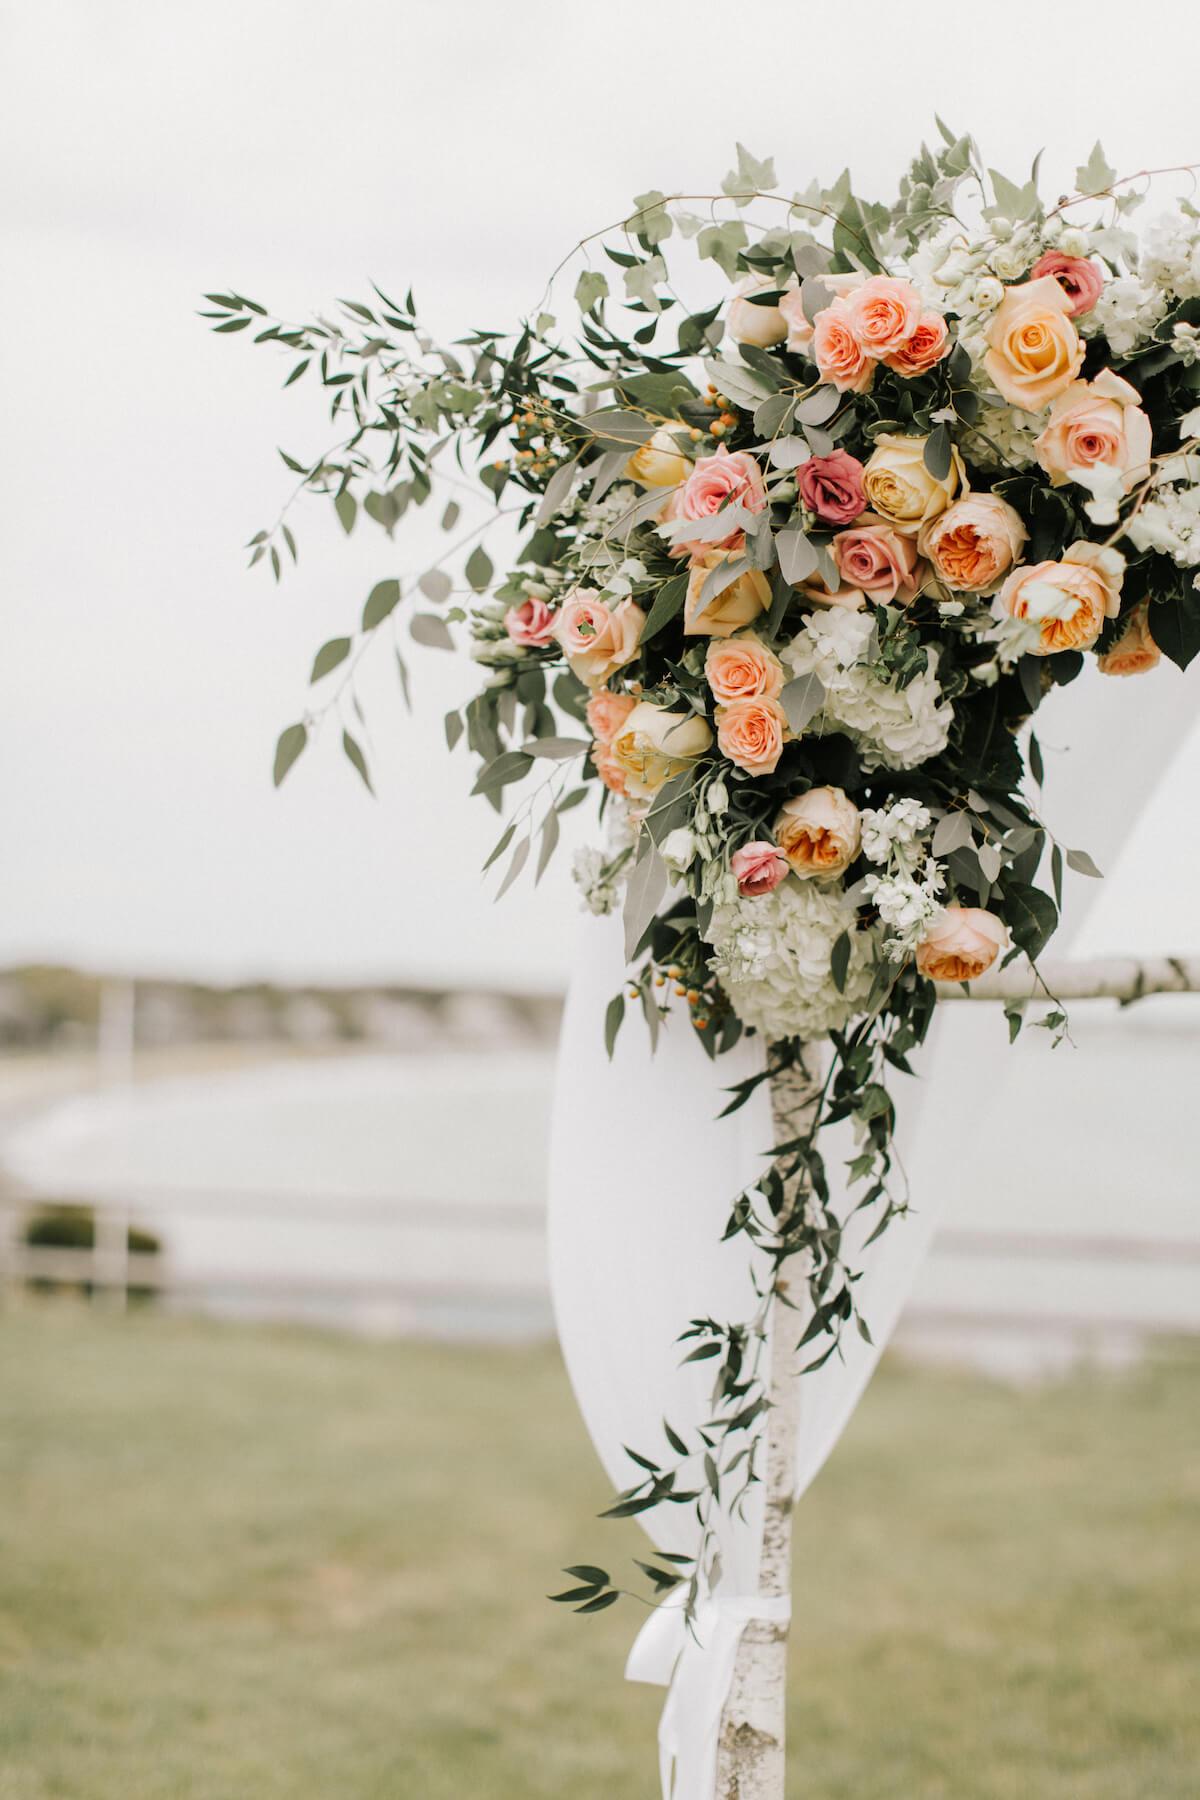 floral-arbor-wedding-ceremony-pastel-roses.jpg